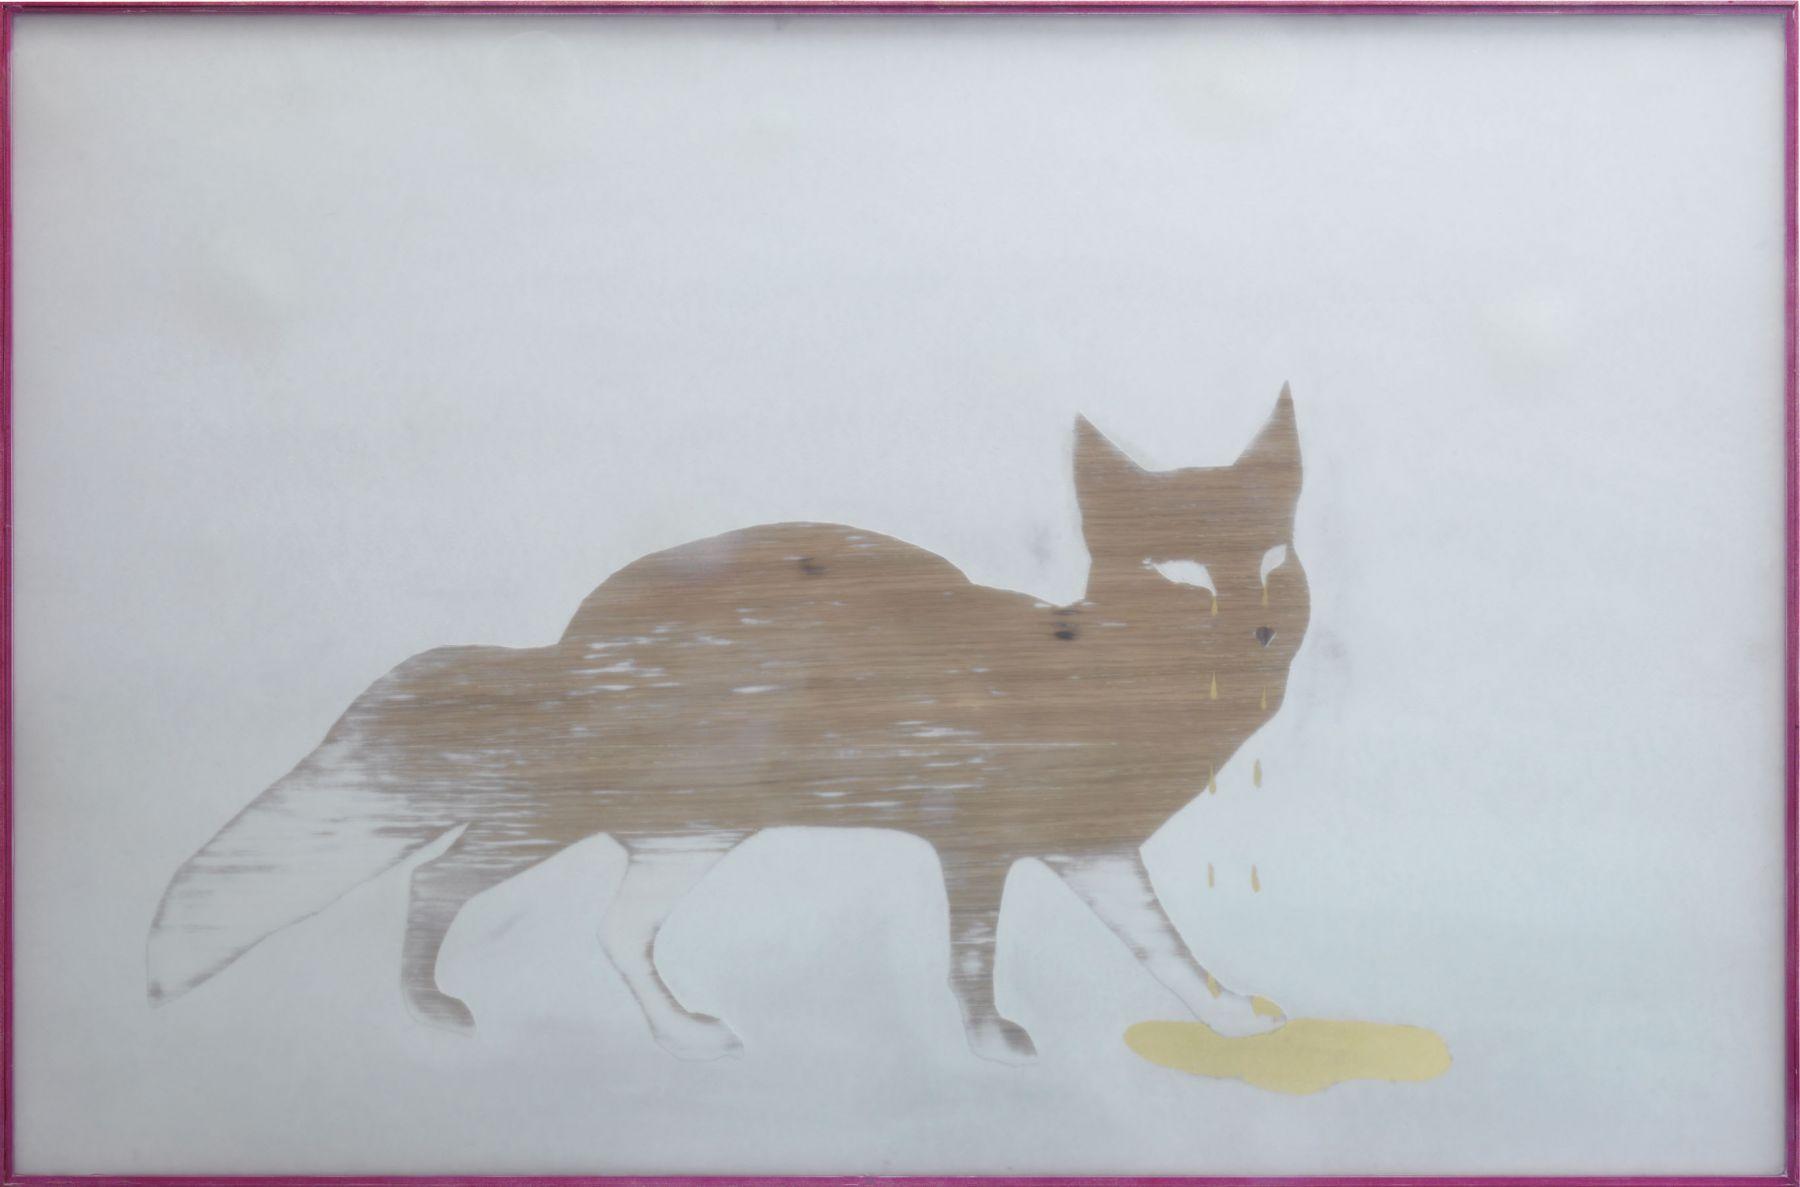 Untitled (Fox), 2009, MDF, veneer, spraypaint, glass, wood